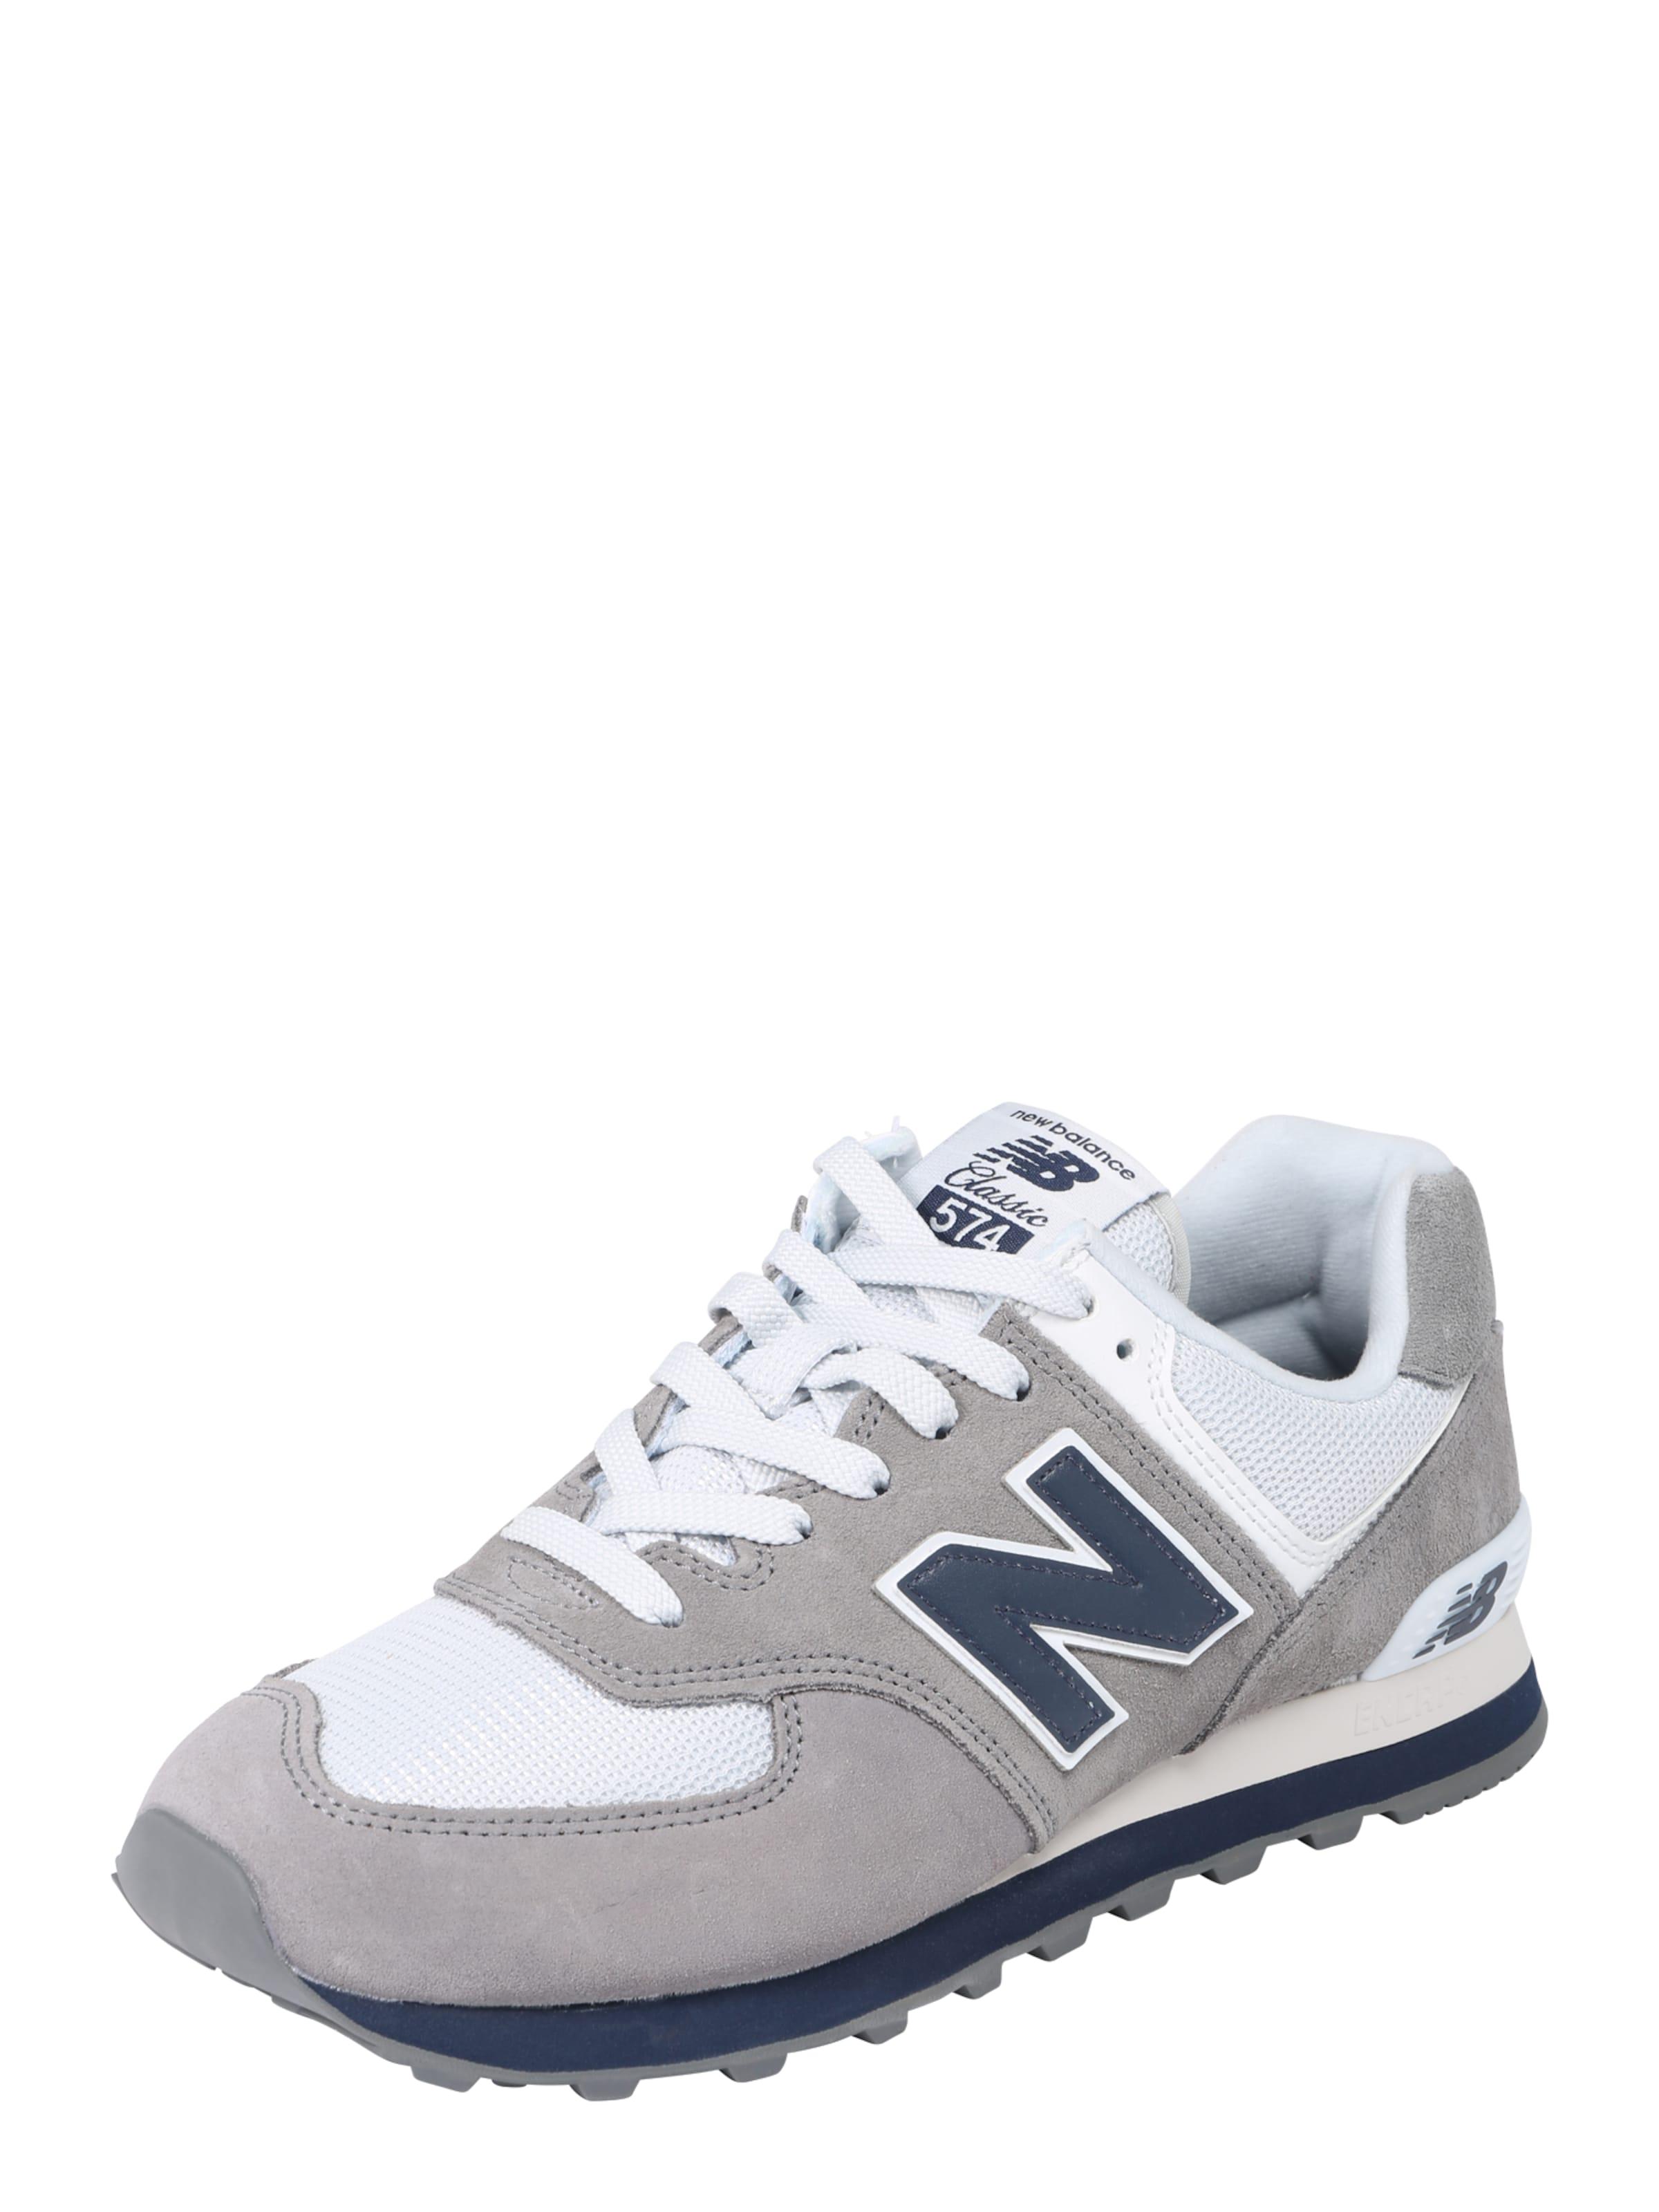 new balance Sneaker ML574 Verschleißfeste billige Schuhe